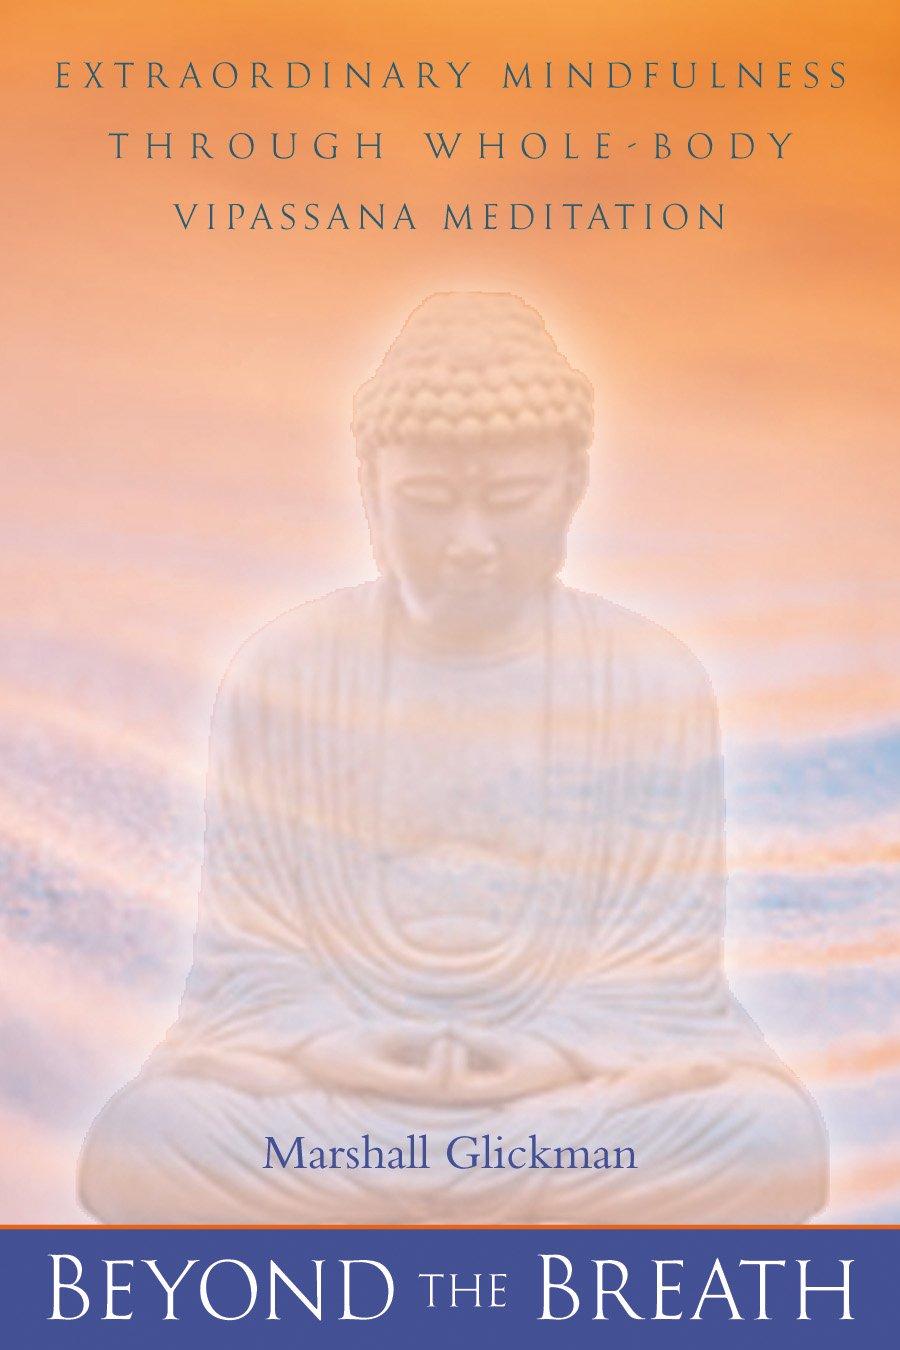 Download Beyond the Breath: Extrordinary Mindfulness through Whole Body Vipassana Meditation ebook